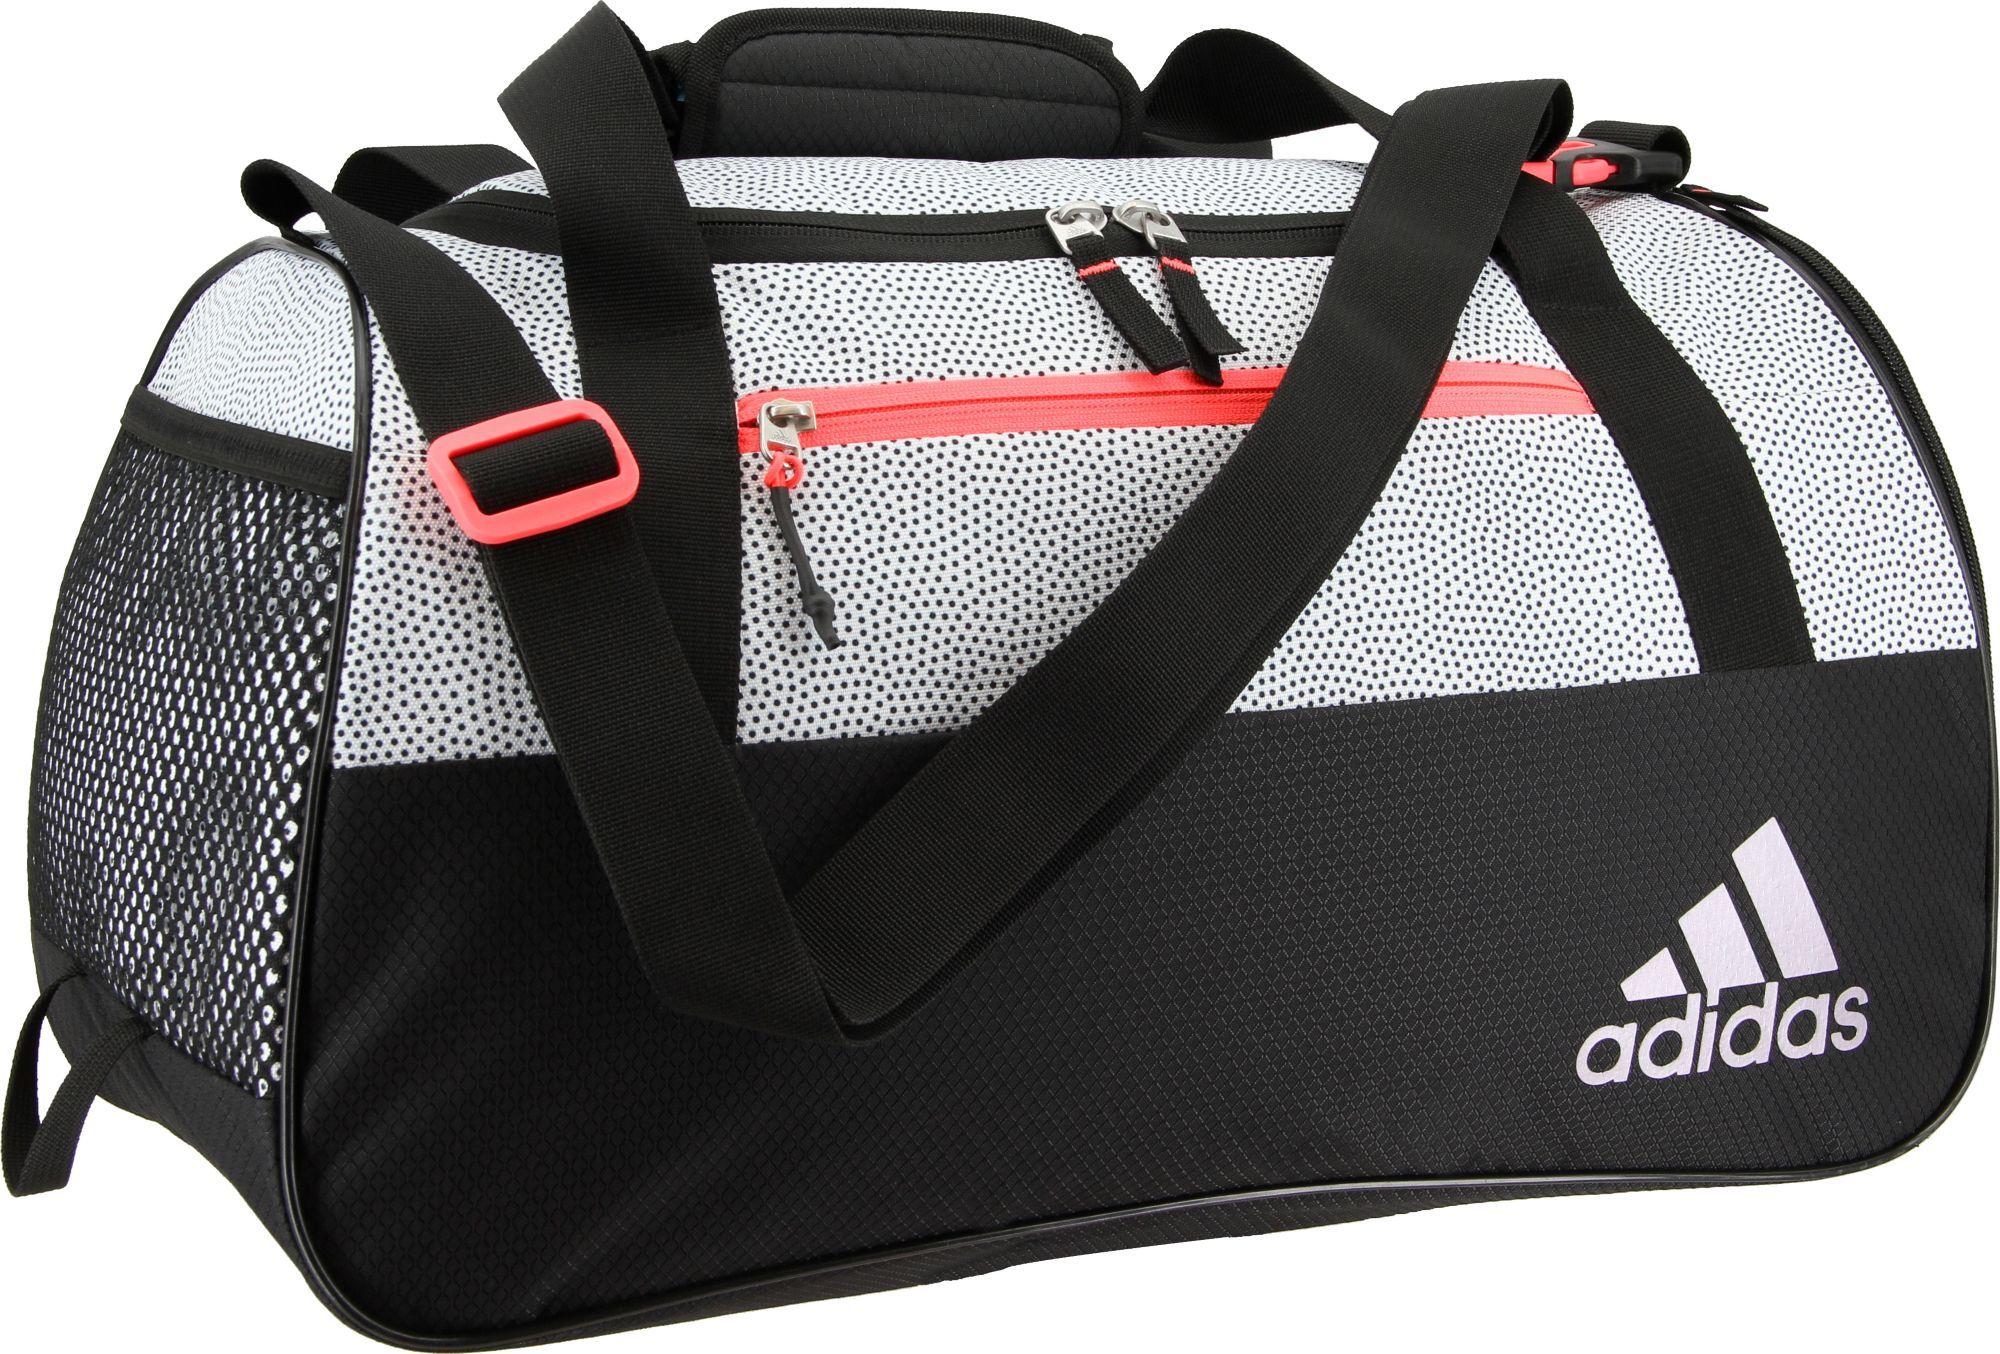 Pin By Josue Mena On Swift Adidas Duffle Bag Duffle Bag Travel